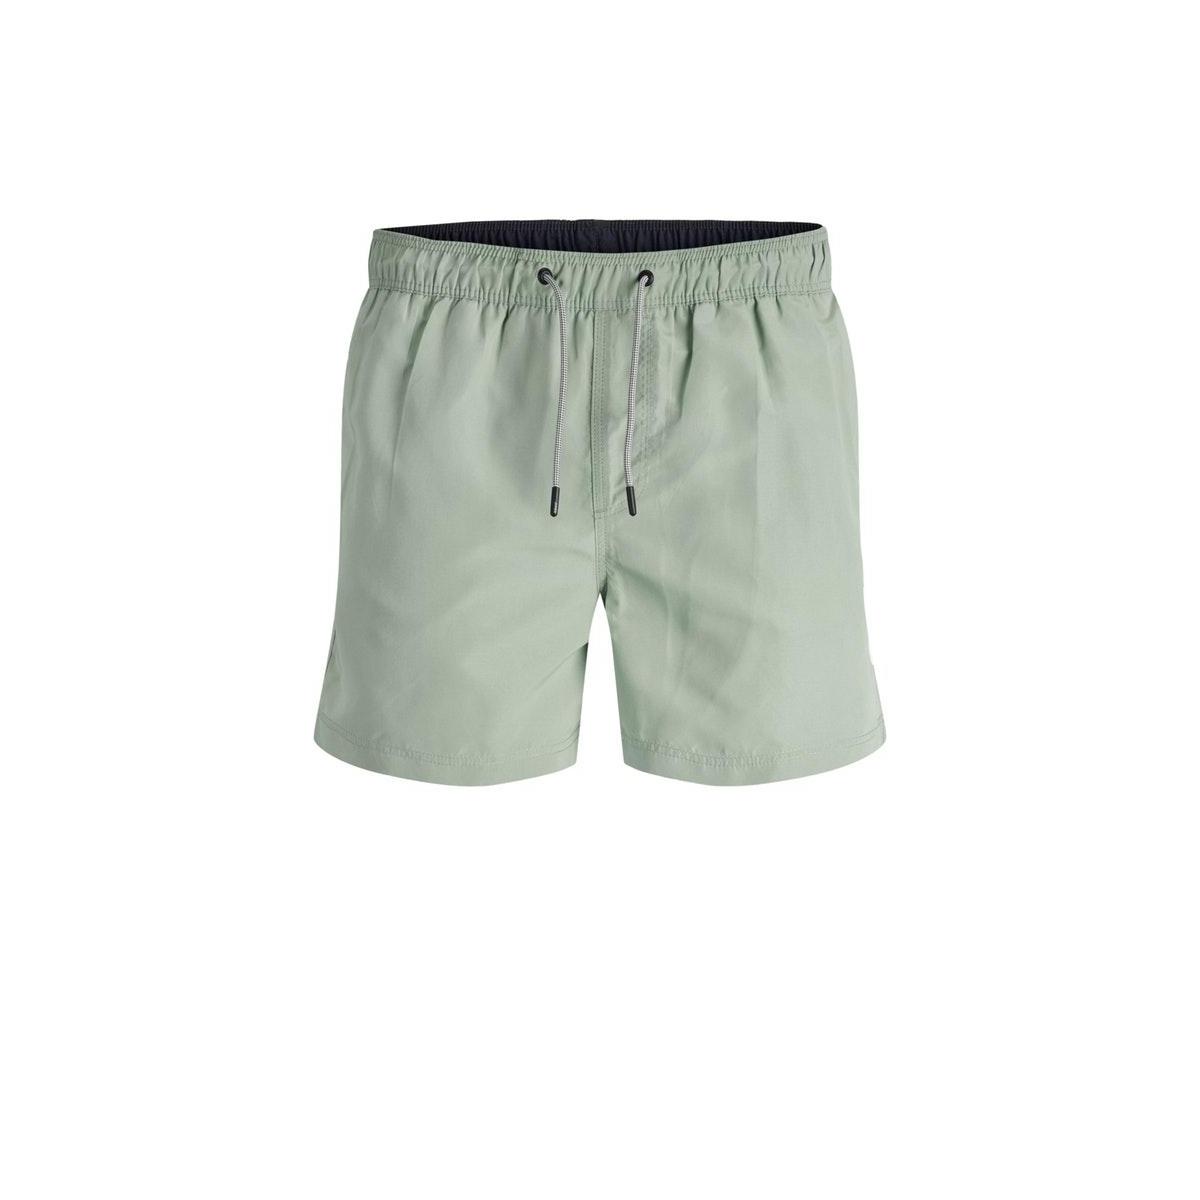 jjiaruba jjswim shorts akm sts 12166349 jack & jones korte broek green milieu